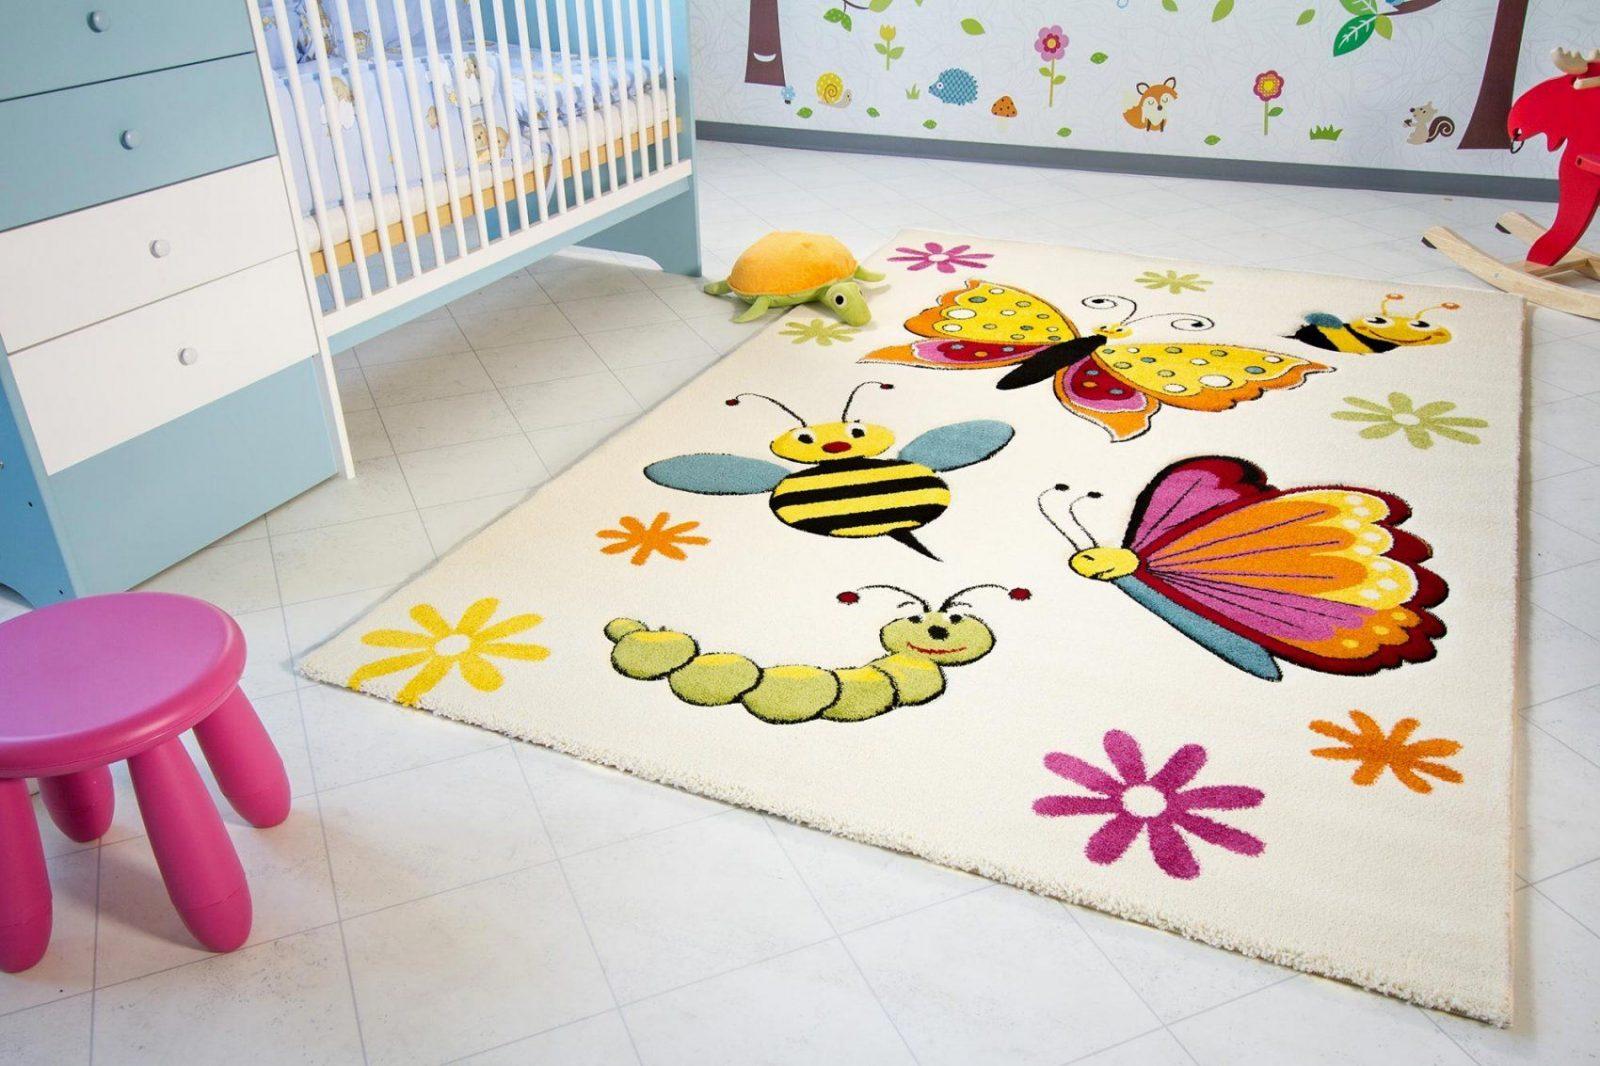 ikea teppich f r kinderzimmer haus design ideen. Black Bedroom Furniture Sets. Home Design Ideas